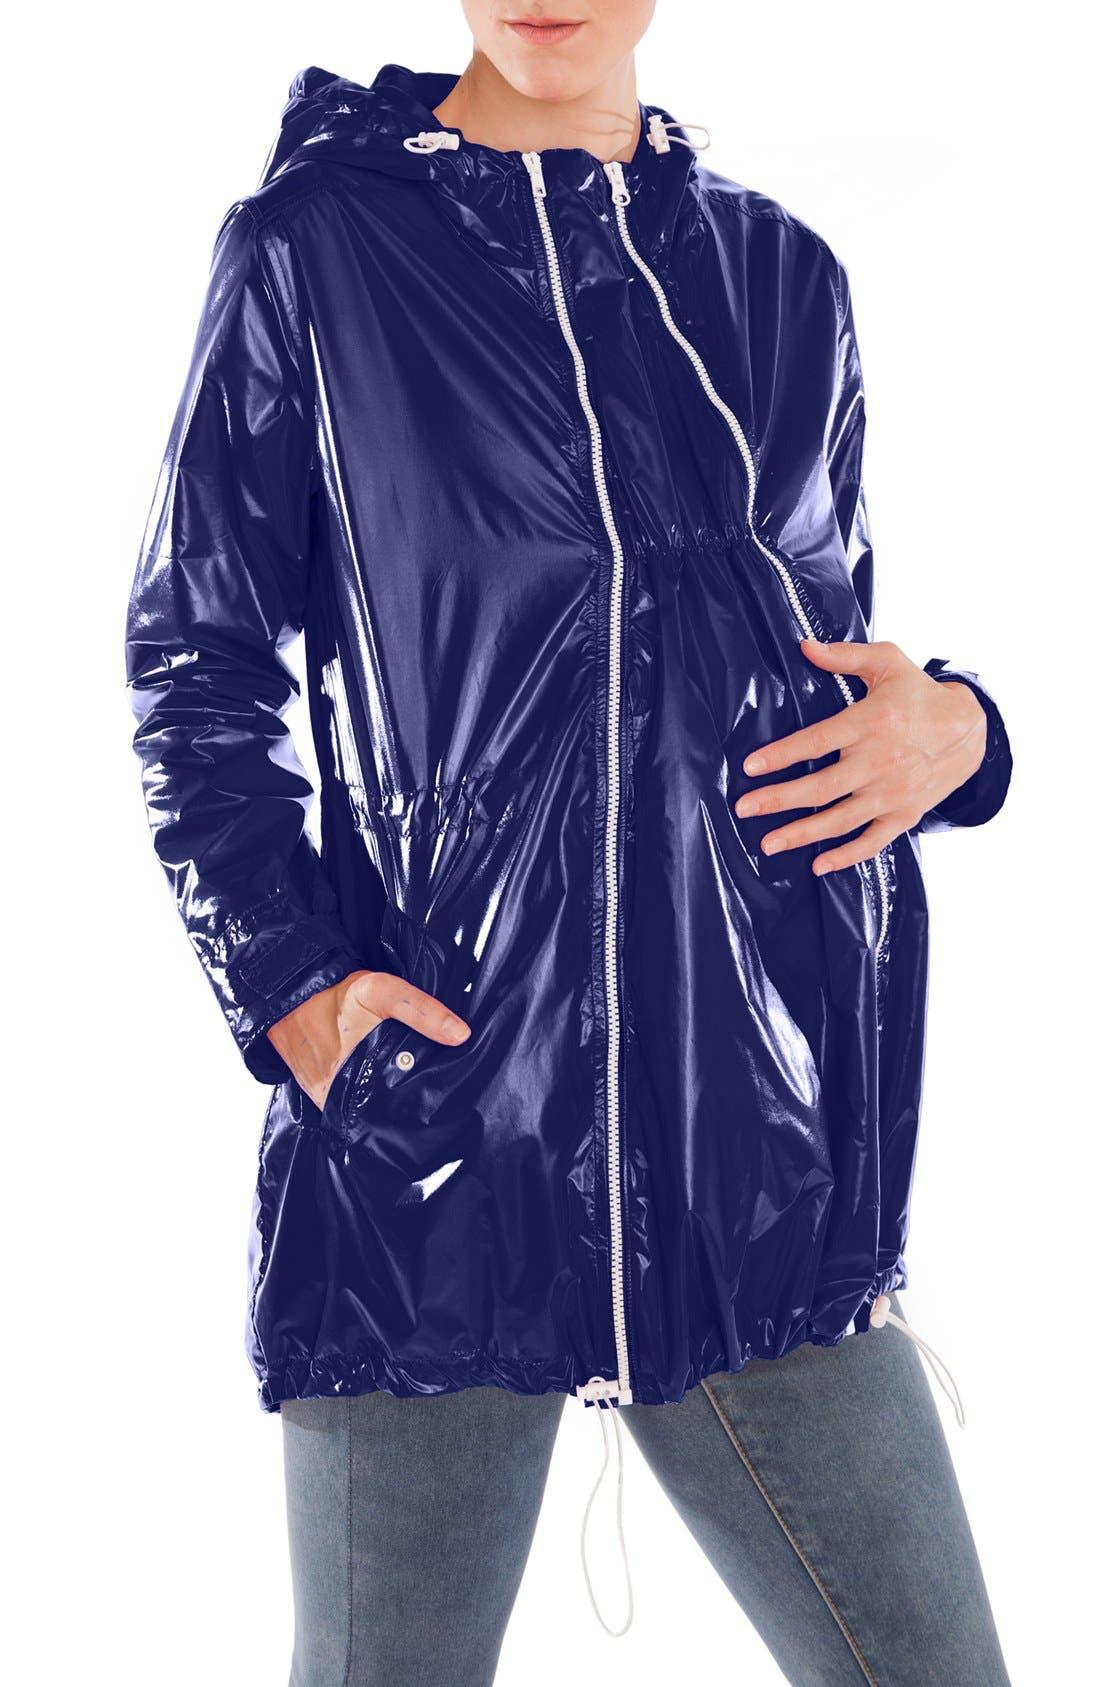 Waterproof Convertible 3-in-1 Maternity Raincoat,                             Main thumbnail 1, color,                             BRIGHT NAVY